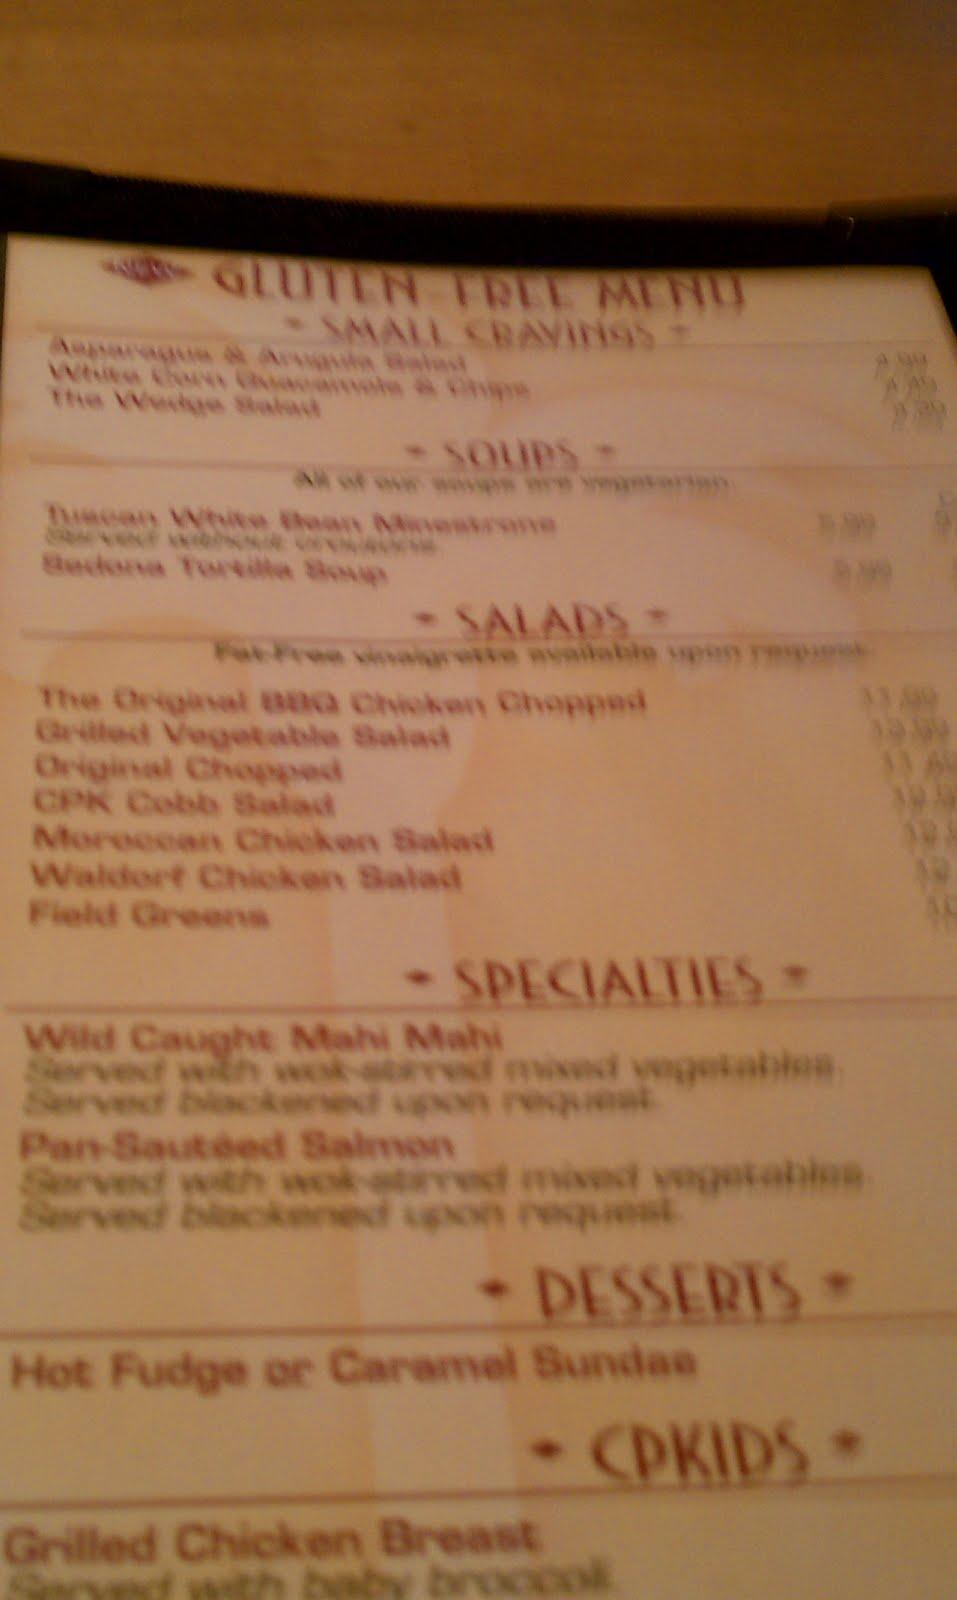 California Pizza Kitchen Southpoint Menu